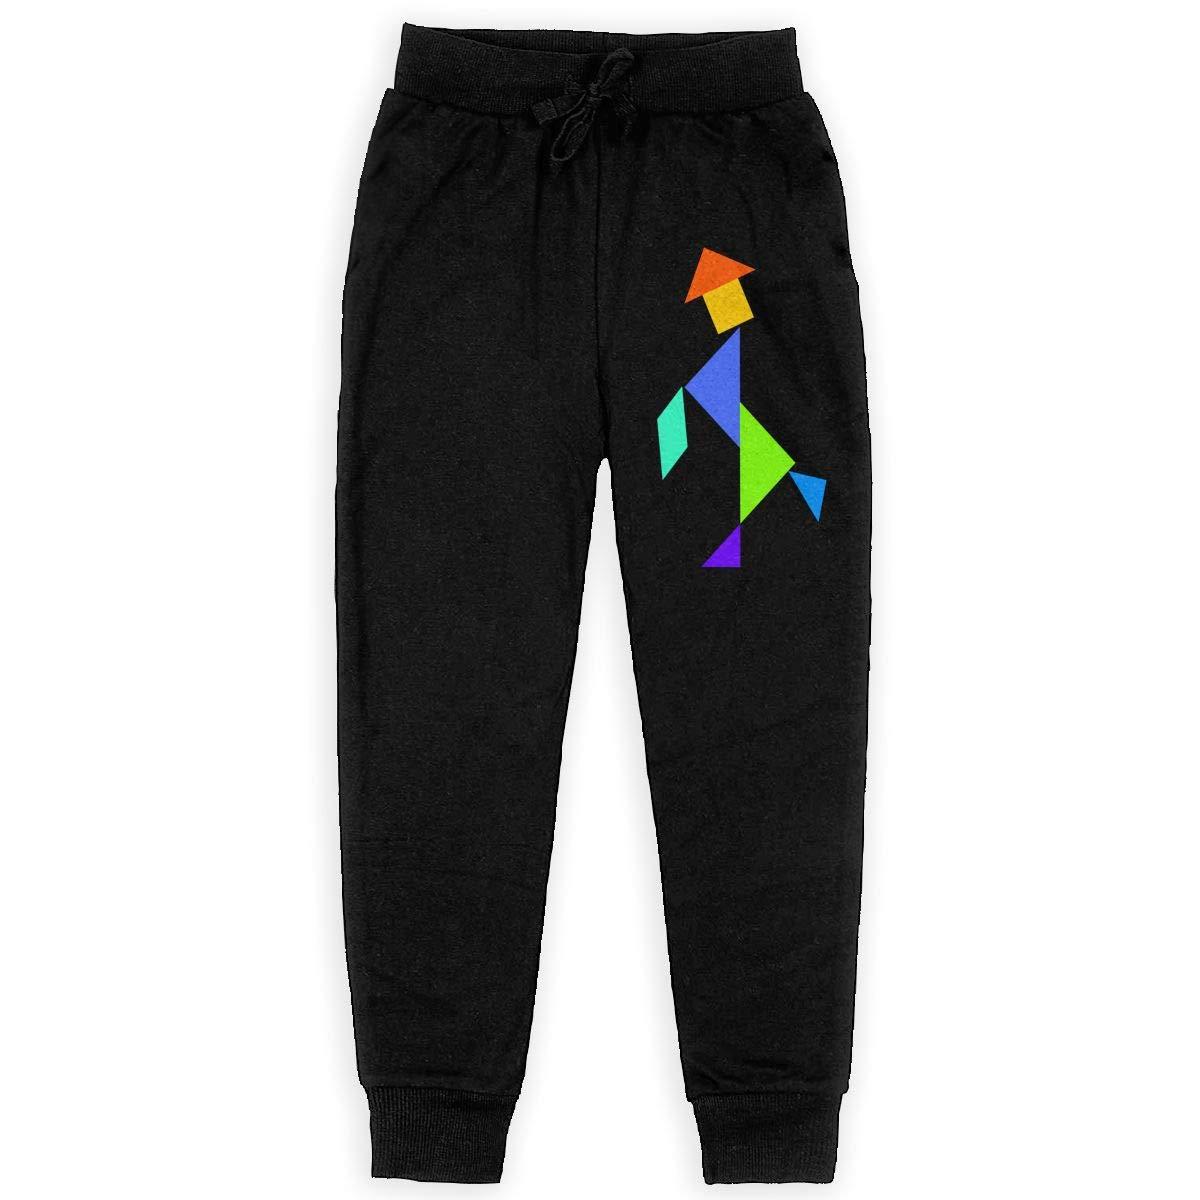 Youth Warm Fleece Active Pants for Teen Girls WYZVK22 Maui Hawaiian Soft//Cozy Sweatpants